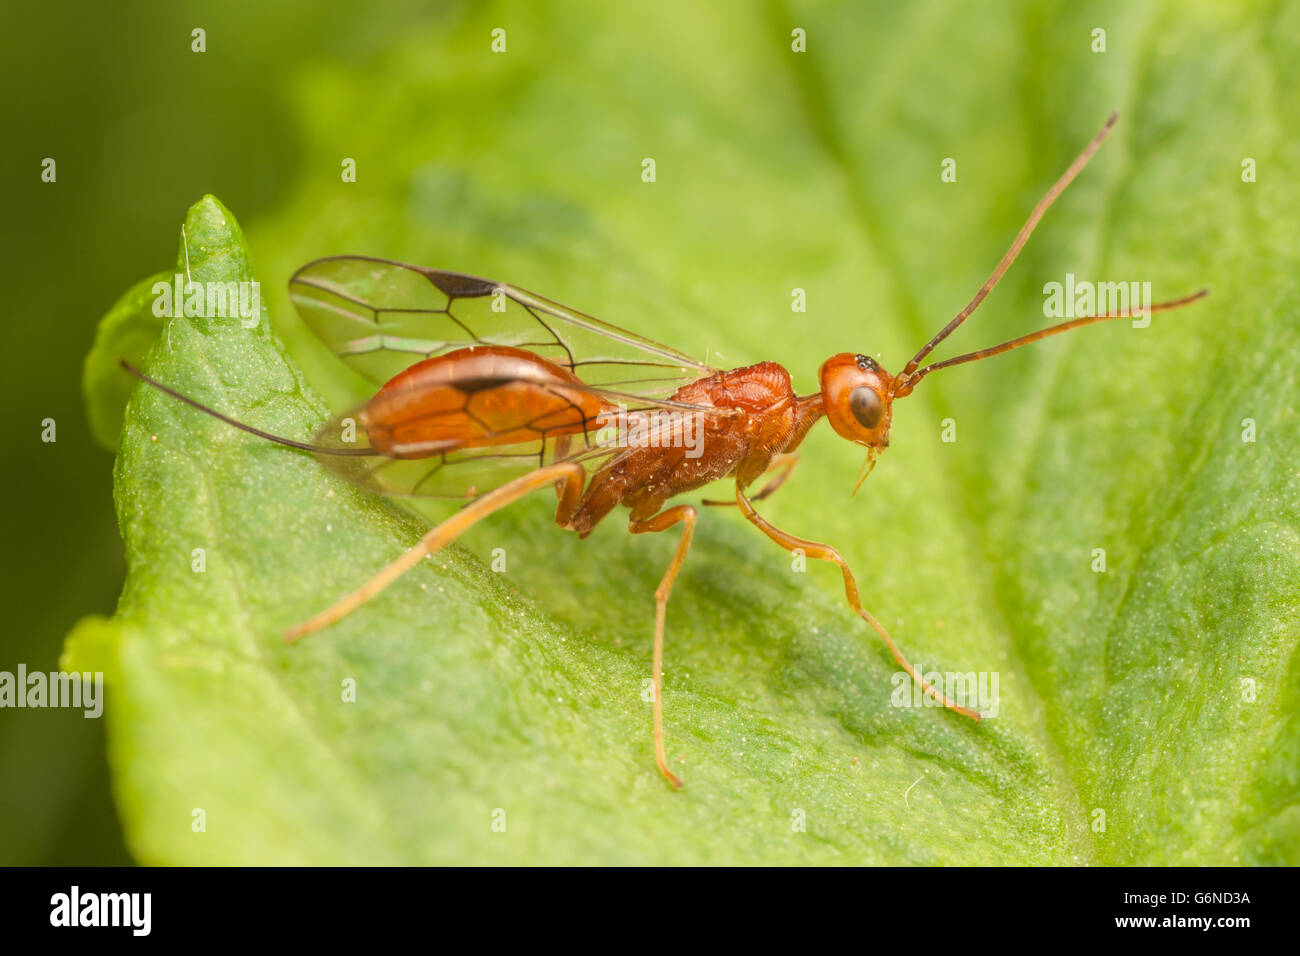 A female Aulacid Wasp (Aulacus burquei) perches on a leaf. - Stock Image